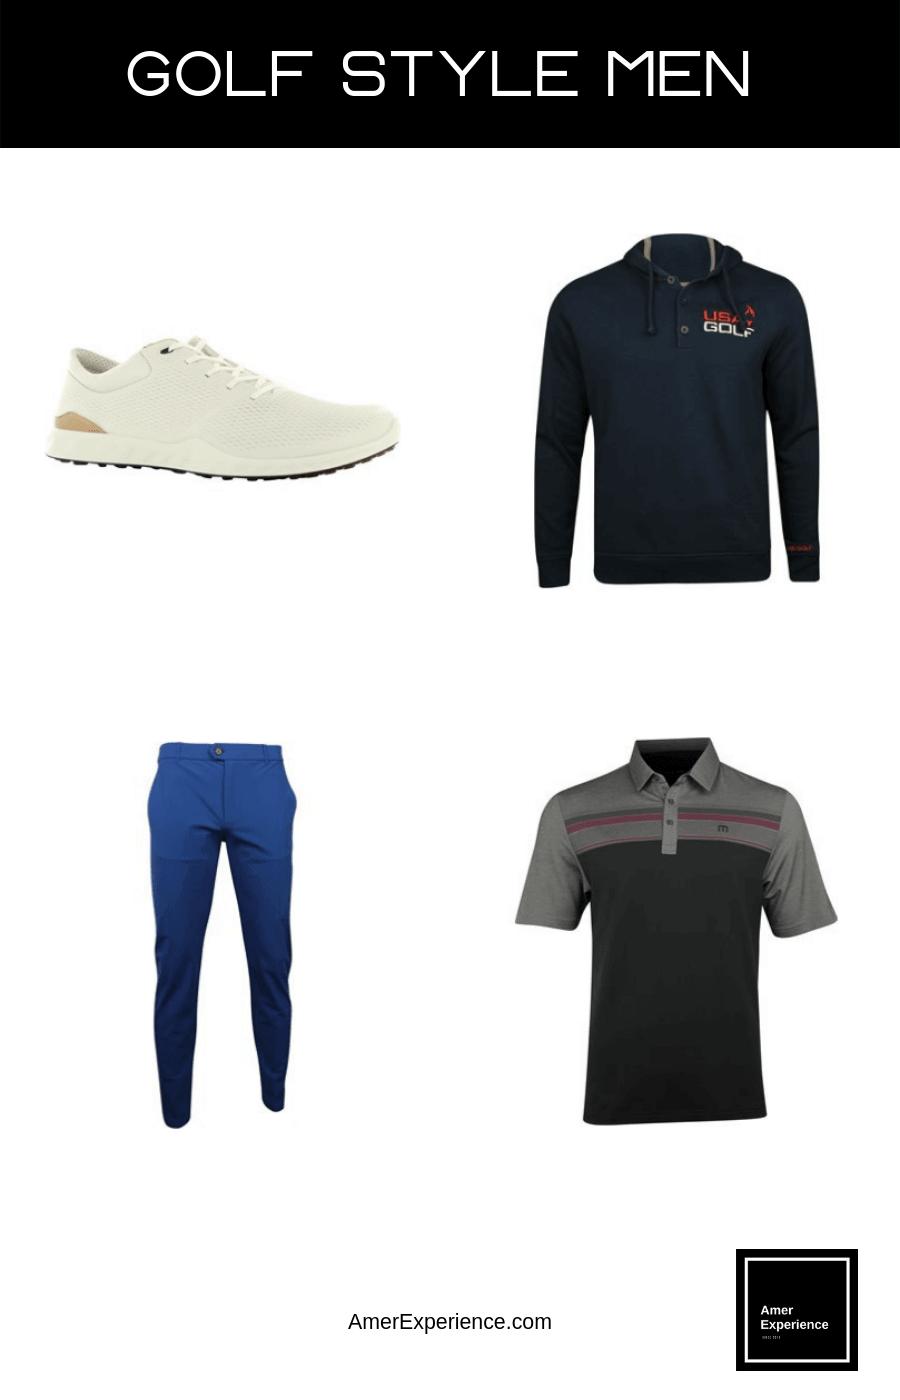 AmerExperience.com - Golf Style Men - Dress Like A PGA Golf Pro -  - Golf Pro Shop Online